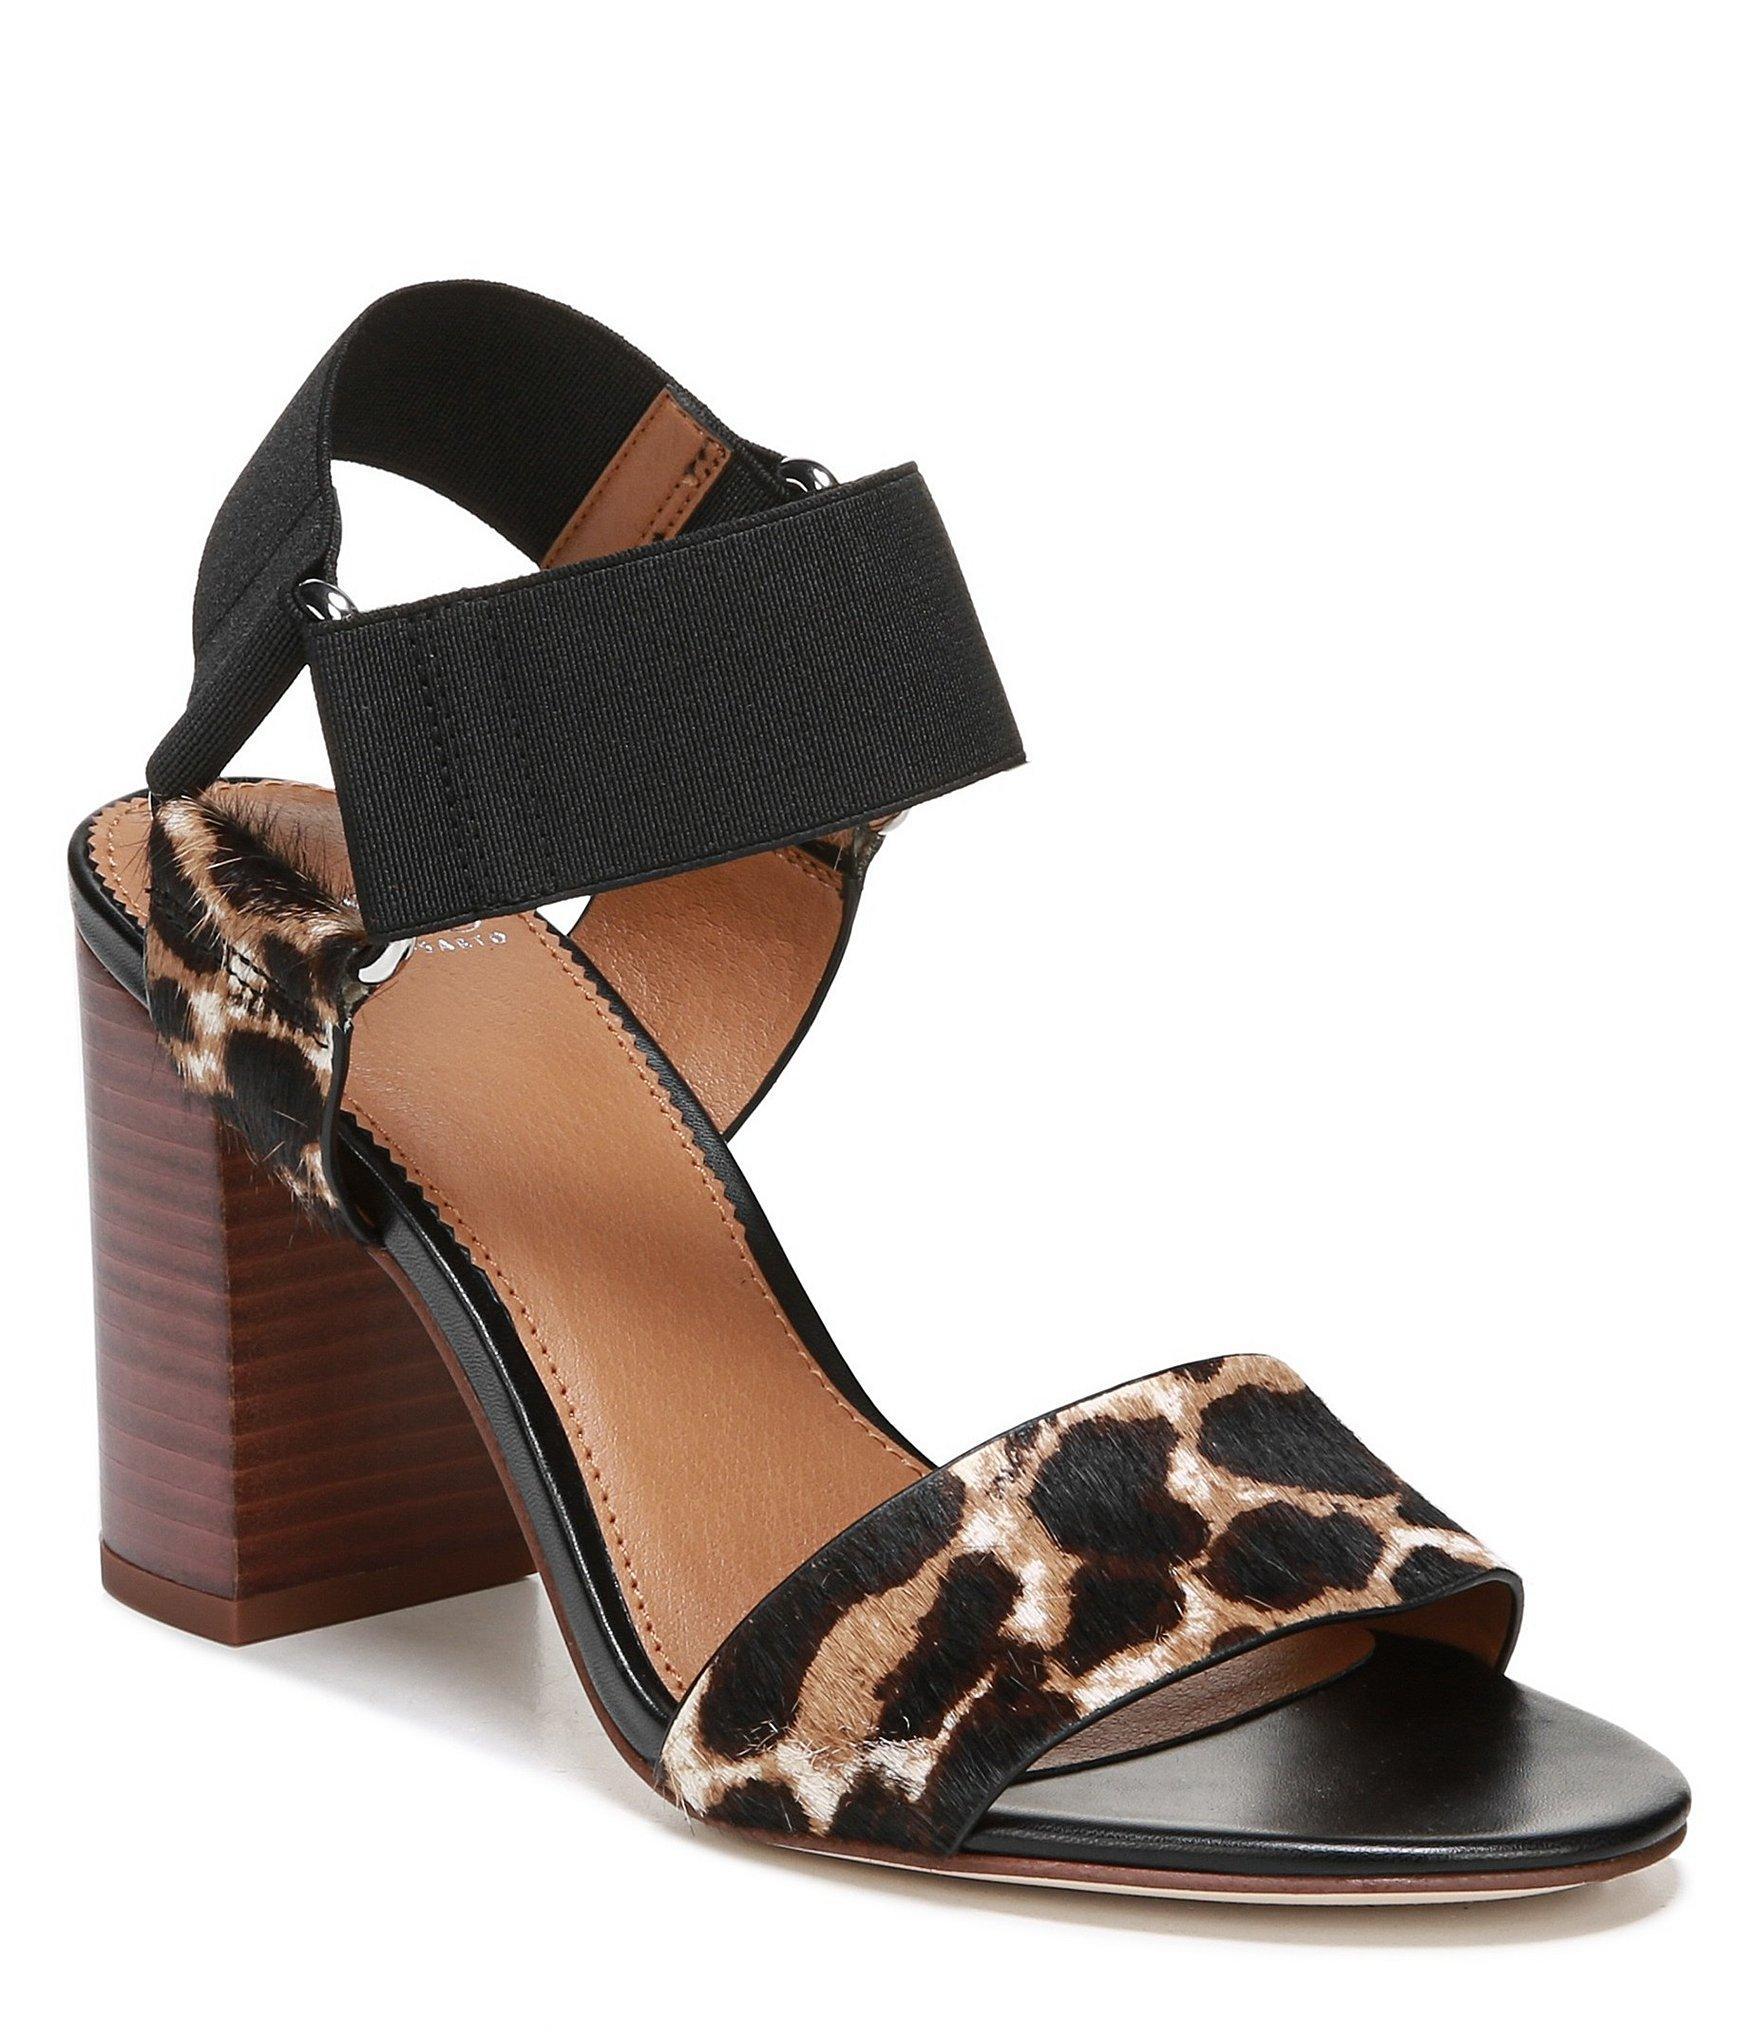 91abe5a6c Franco Sarto. Women s Black Sarto By Olivia Leopard Print Calf Hair Block  Heel Dress Sandals